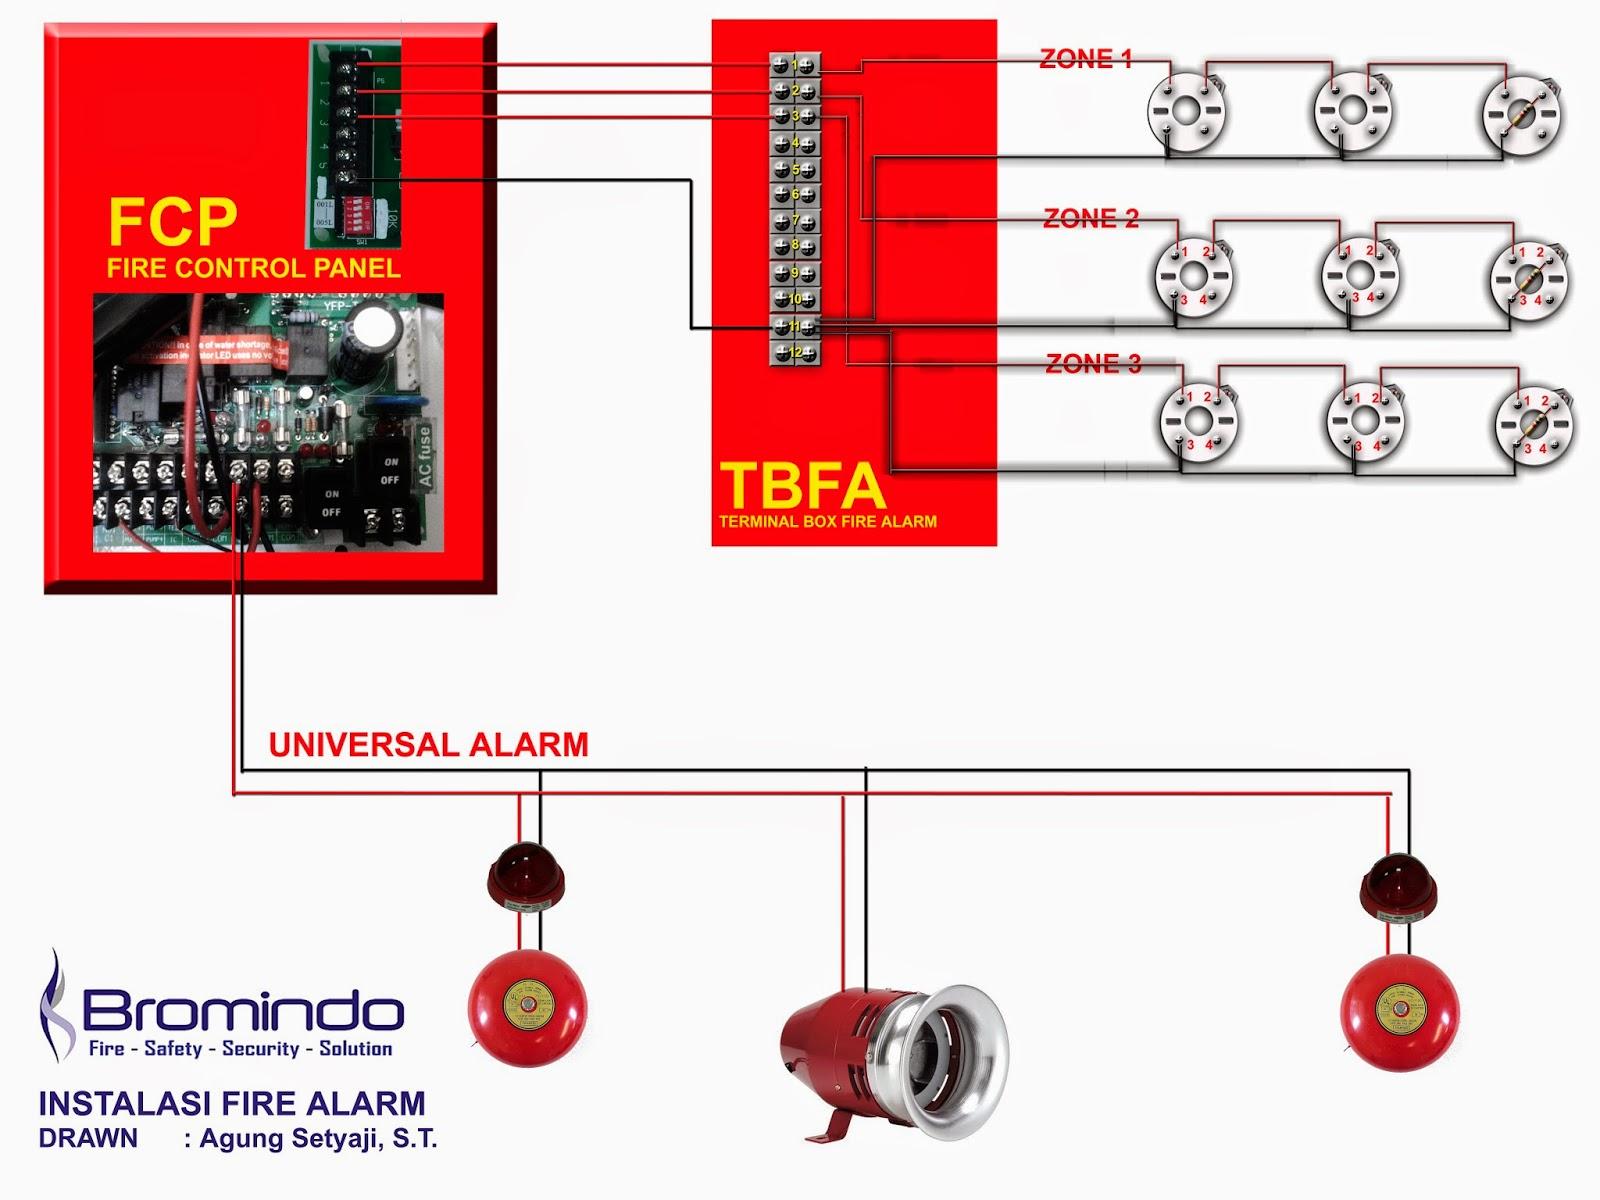 fire alarm wiring diagram pdf honda crv notifier db25 female connector